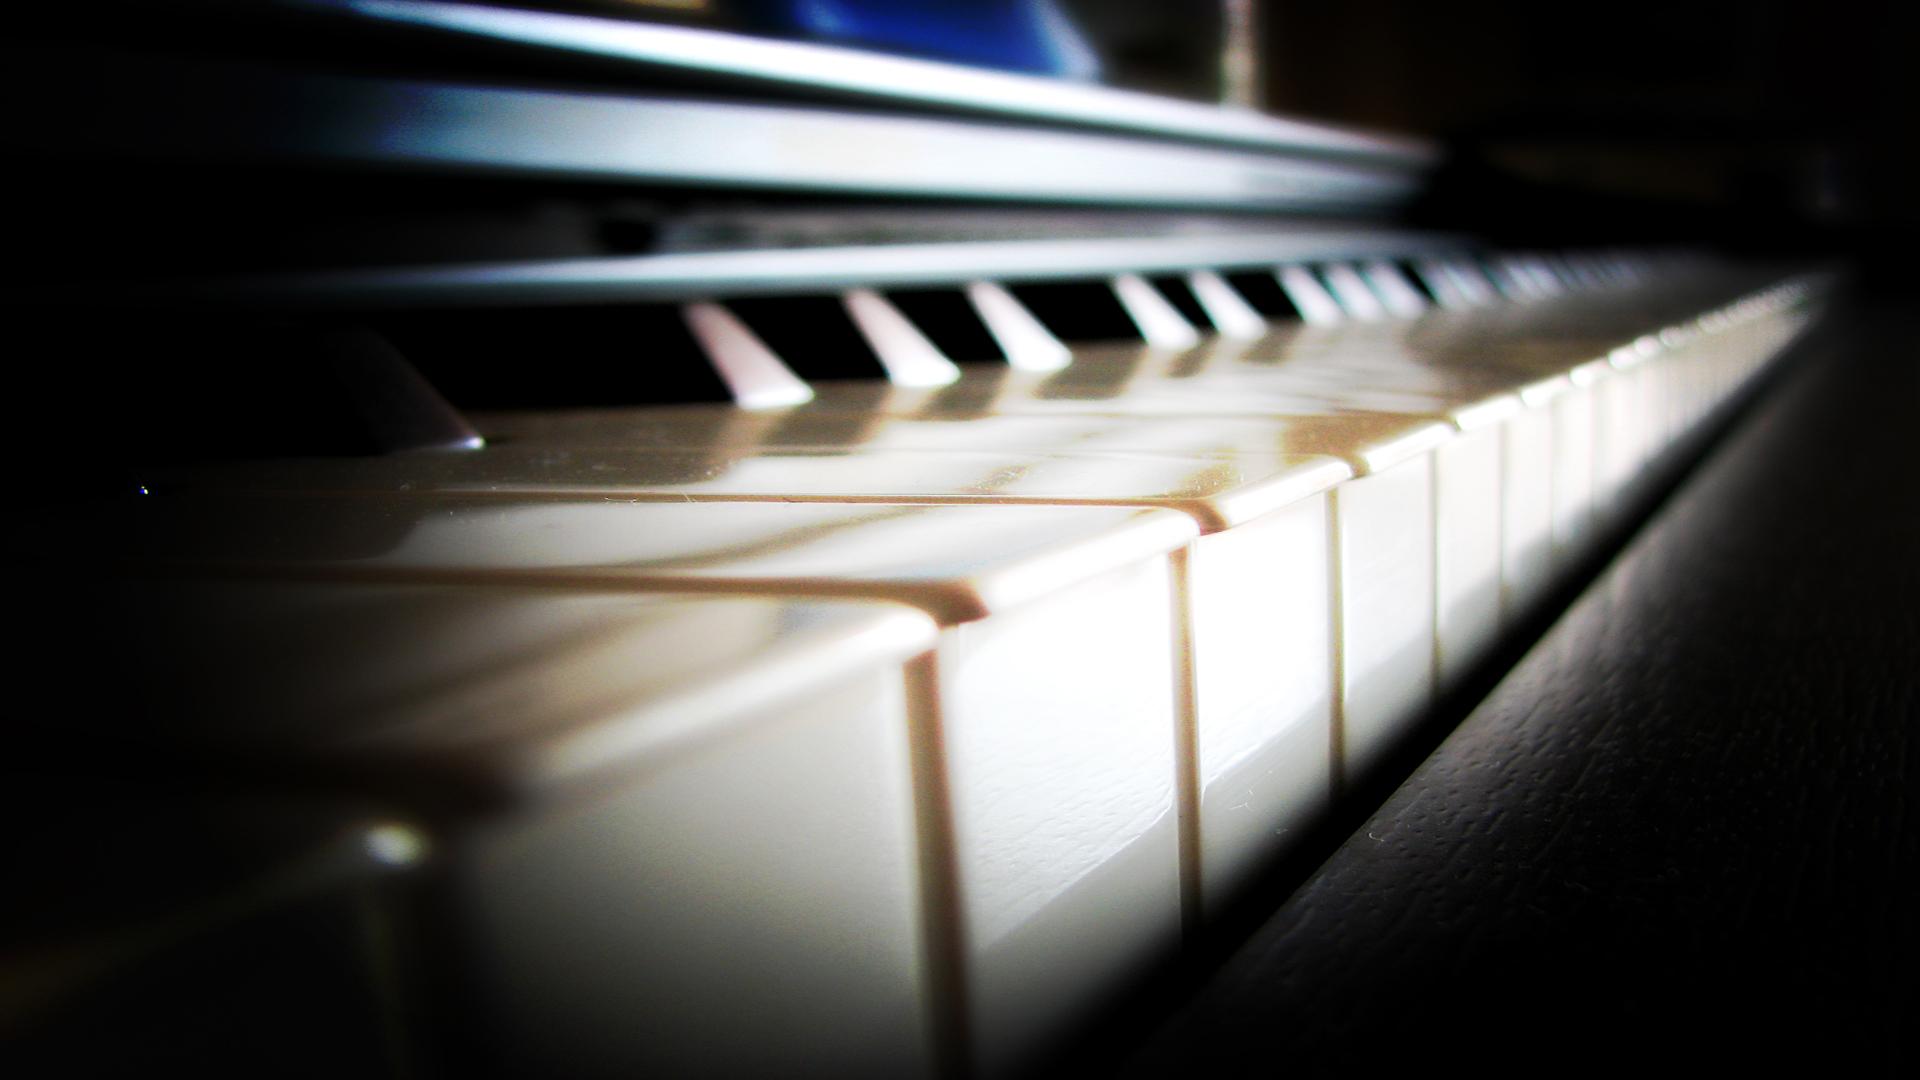 Piano Computer Wallpapers Desktop Backgrounds 1920x1080 HD Wallpapers Download Free Images Wallpaper [1000image.com]